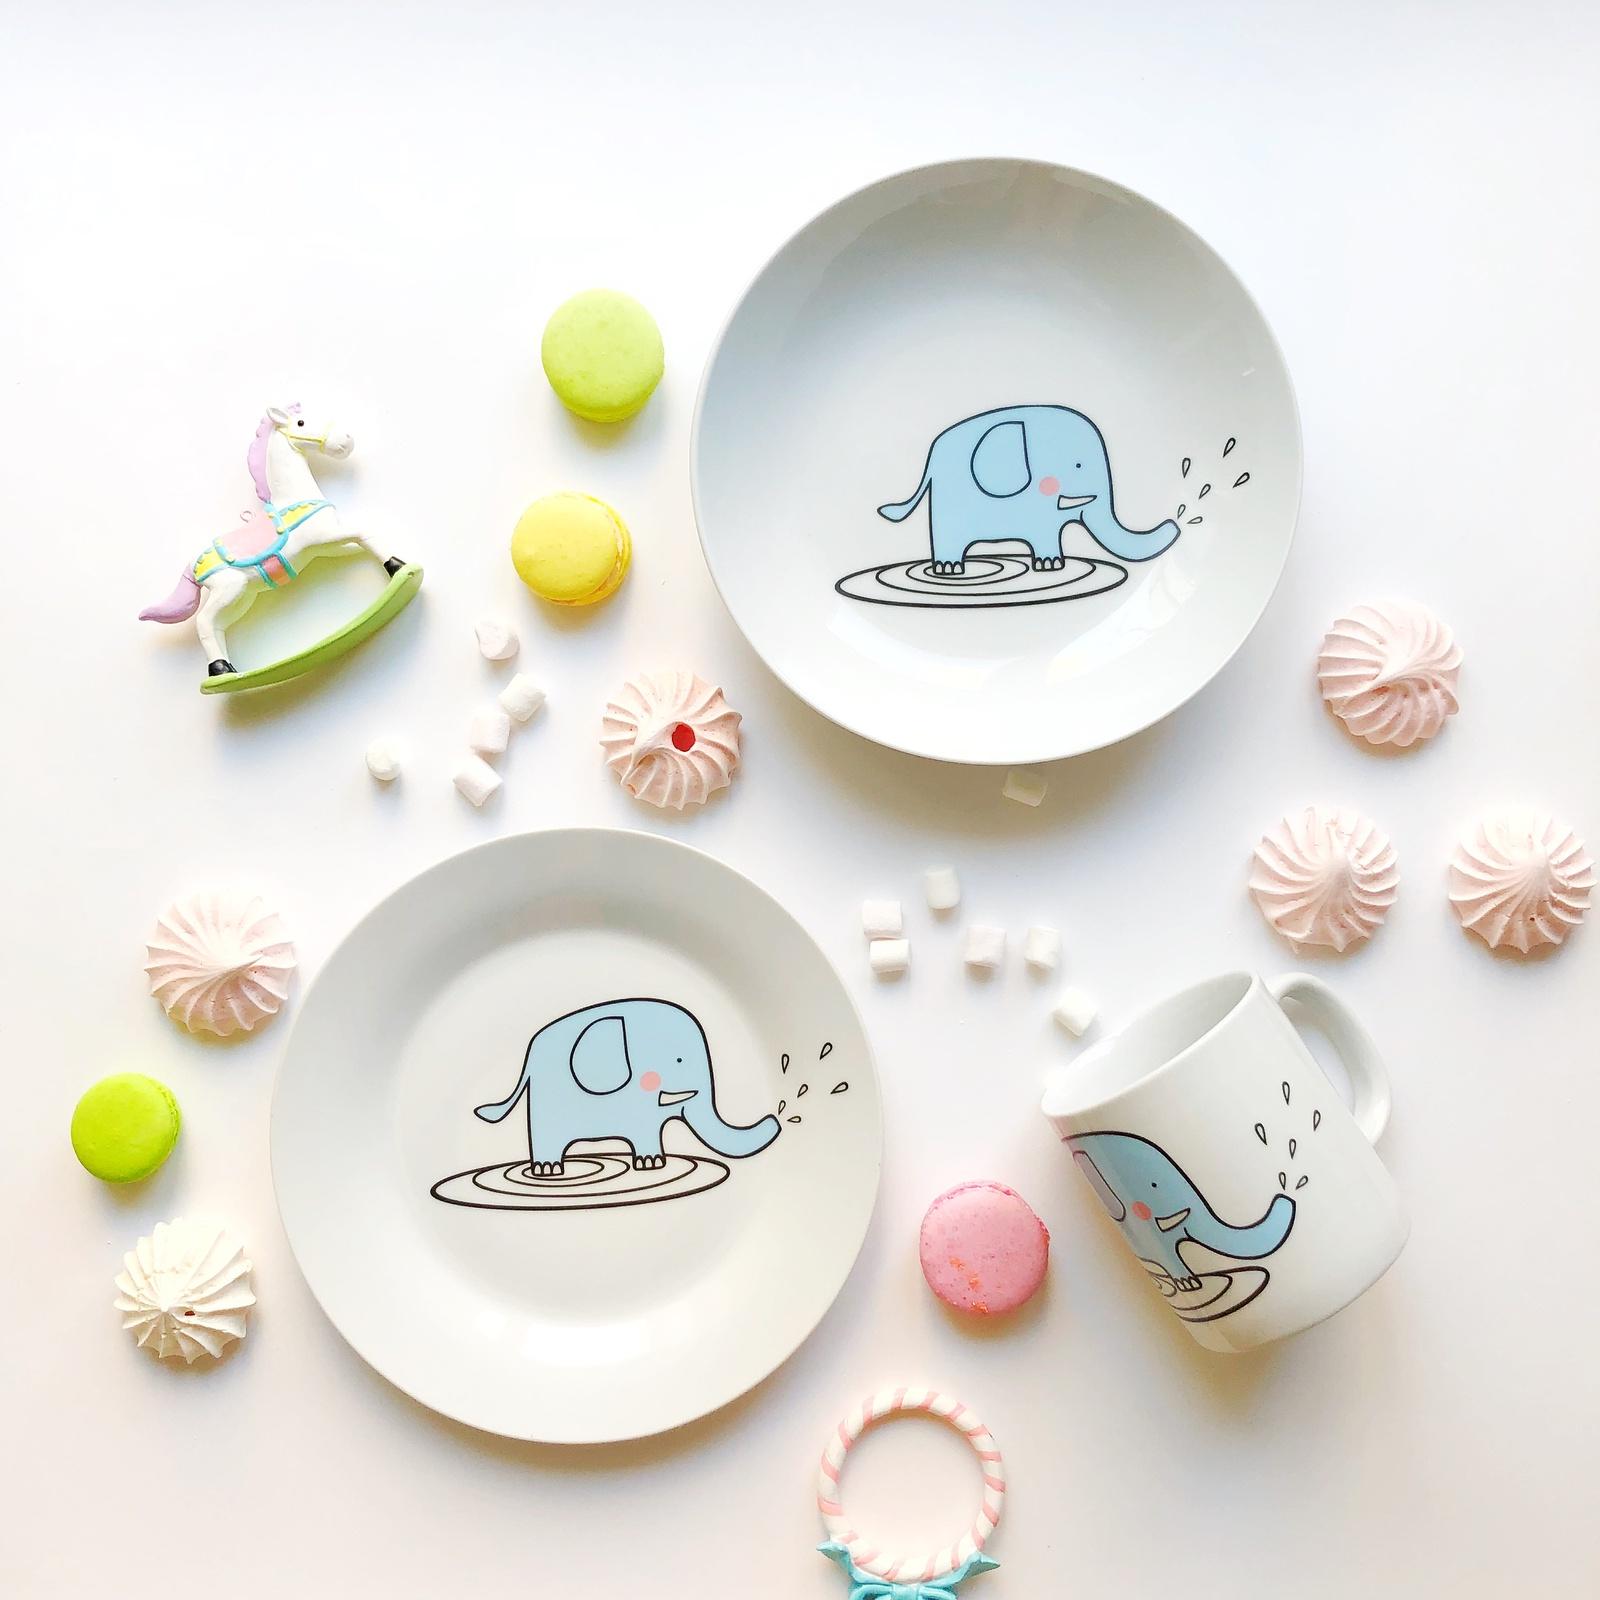 Набор посуды Слон Бубон (3 в 1: кружка+тарелка+глубокая тарелка Sans Brides) тарелка сотвори чудо слон бубон 20 см фарфор